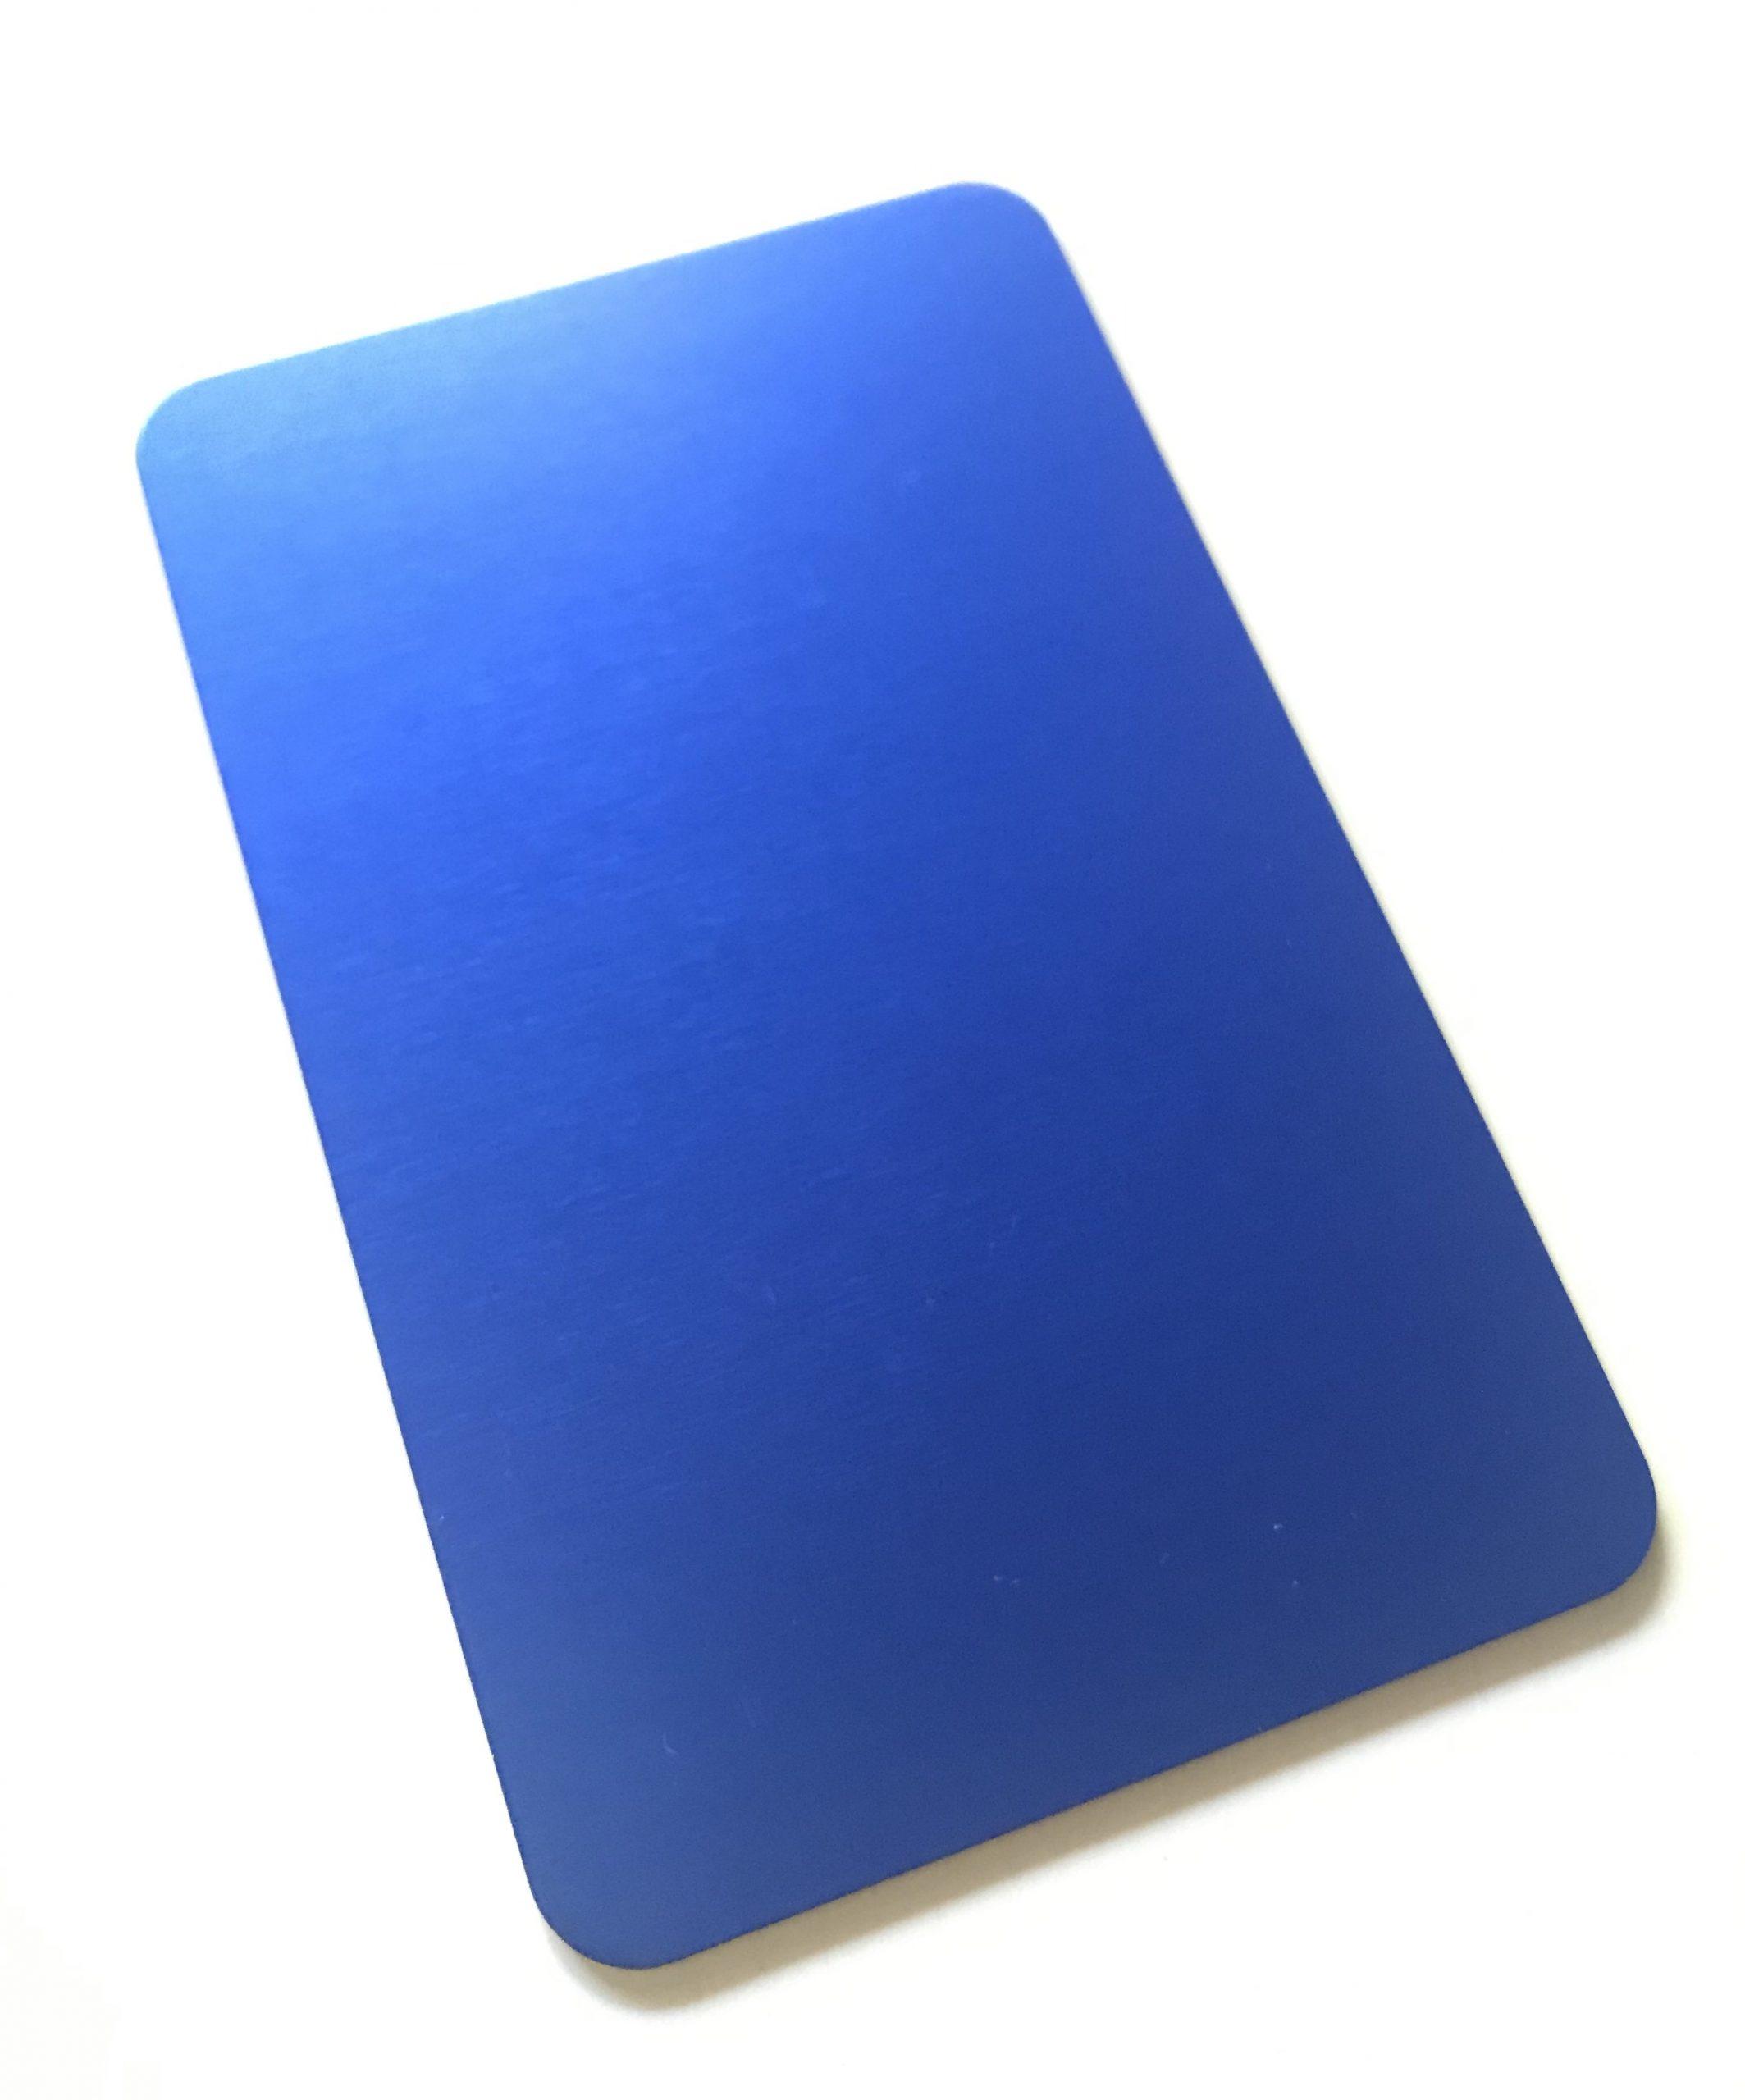 la plaque bleue de nikola tesla